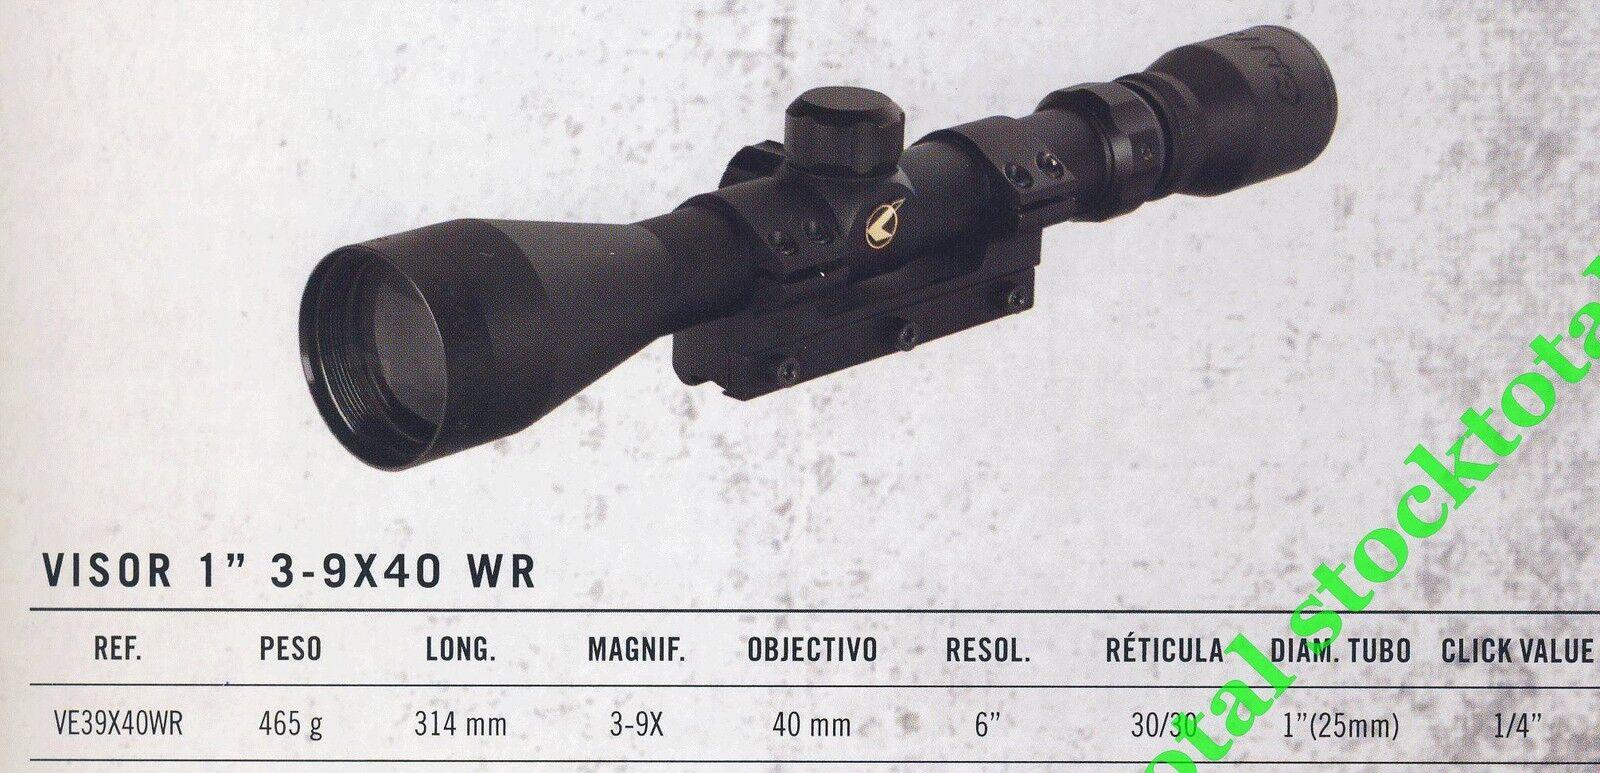 Visor telescopico gamo GAMO SERIE SPORTER 1  3-9X40WR  VE39X40WR G